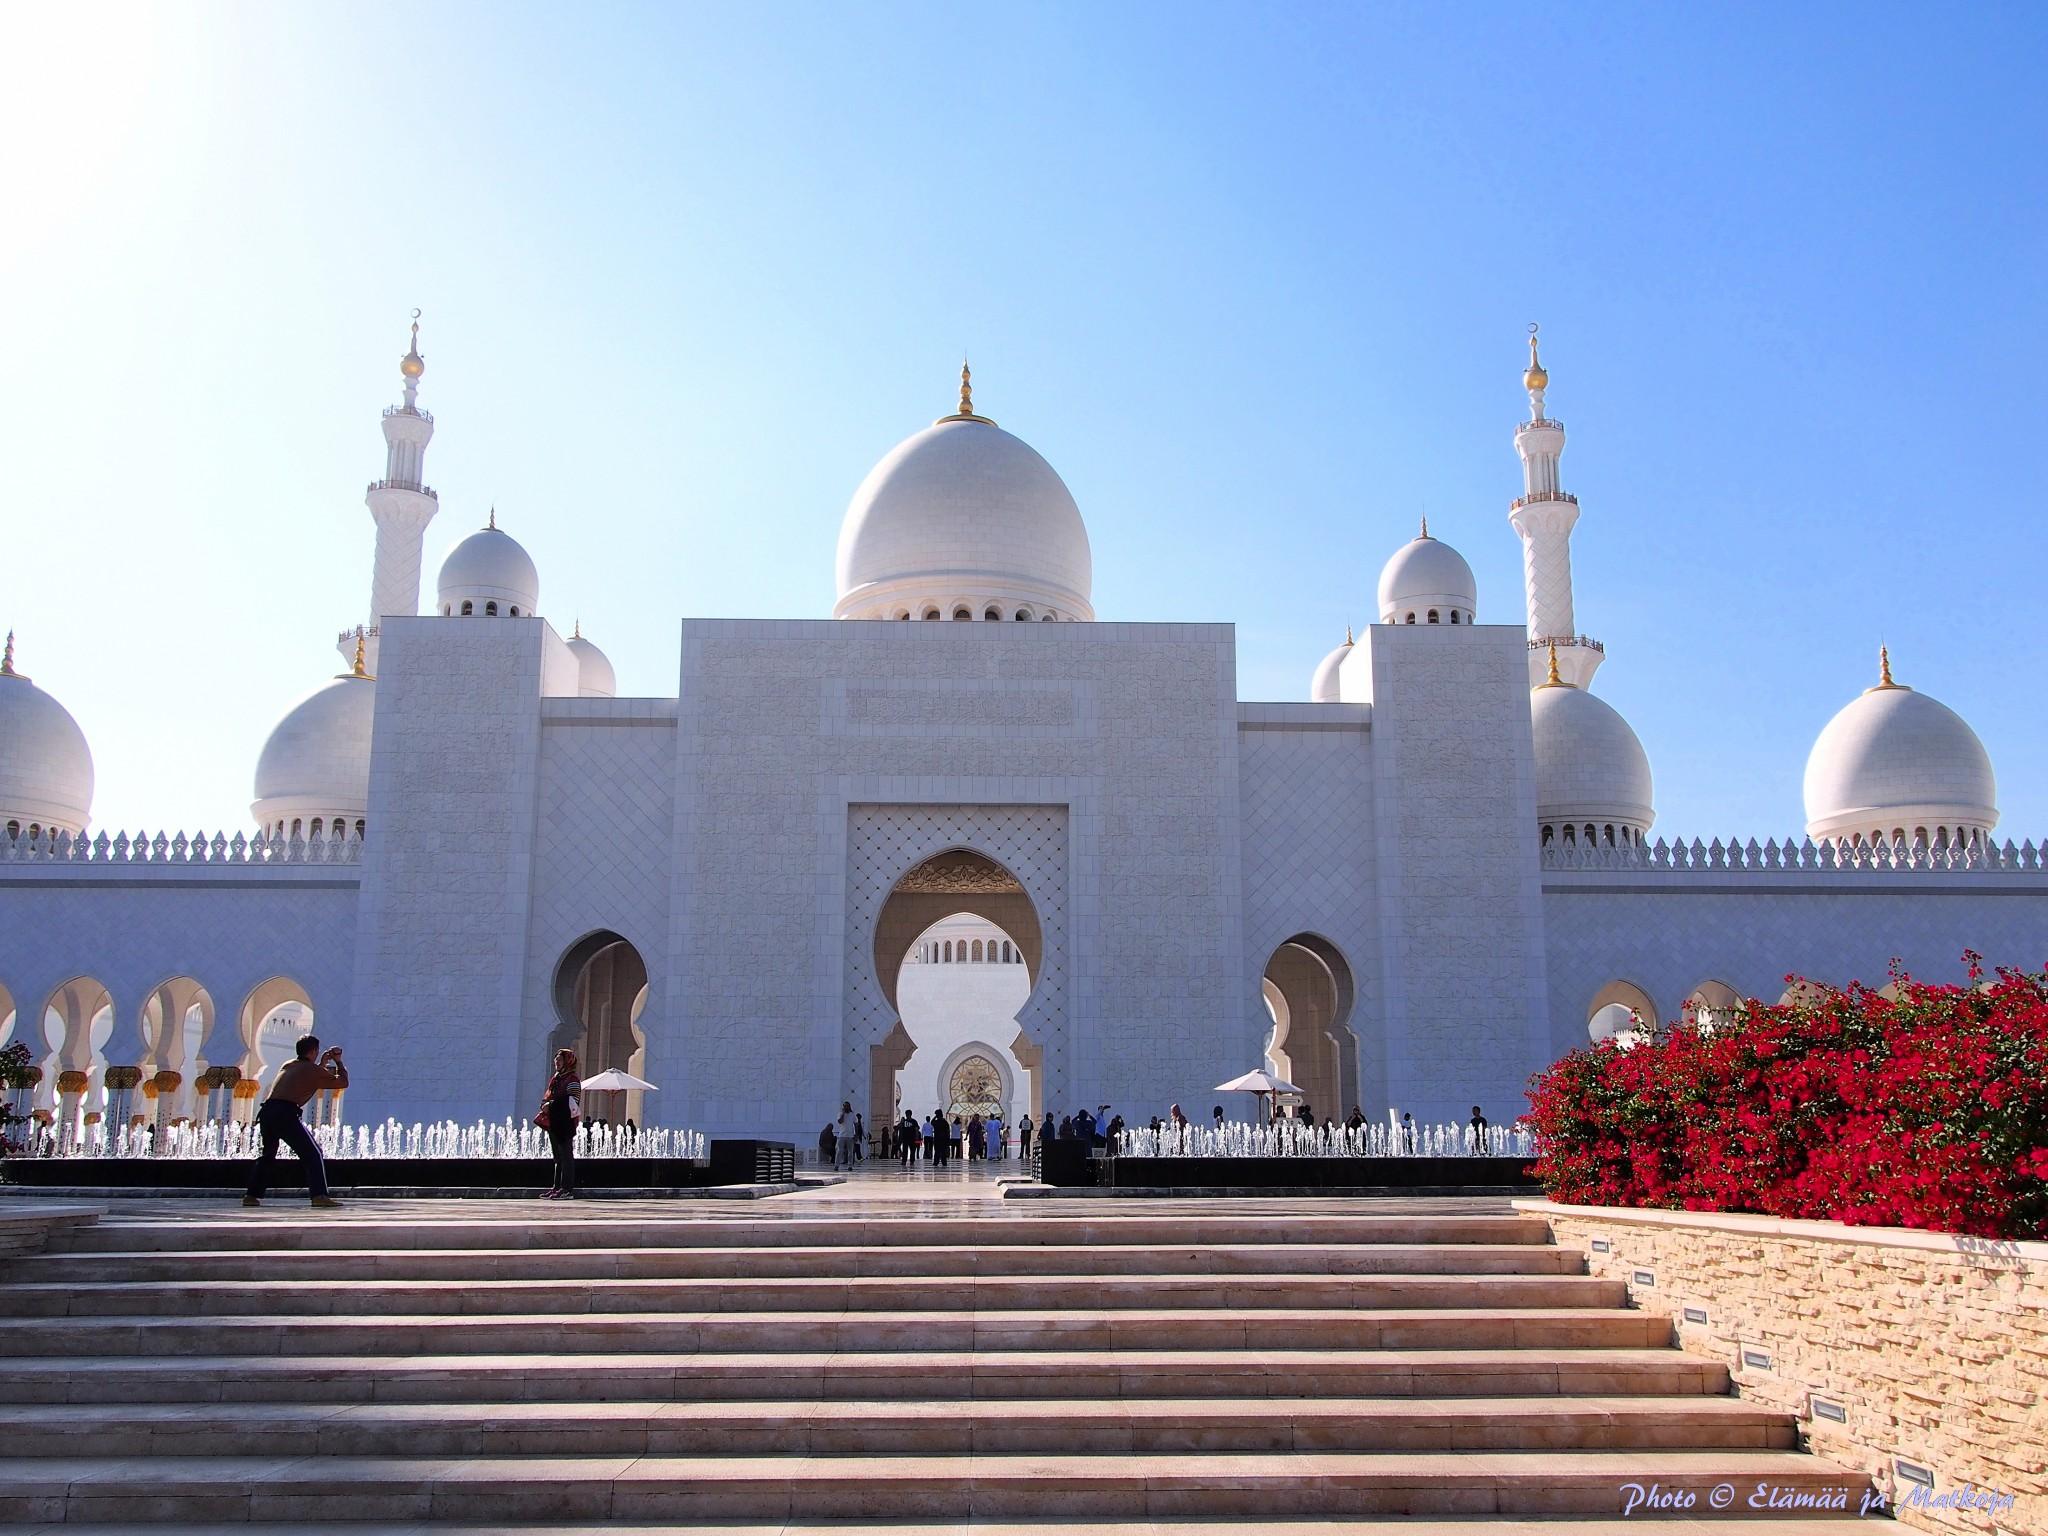 Sheikh Zayed Grand Mosque Abu Dhabi UAE 4 Photo © Elämää ja Matkoja